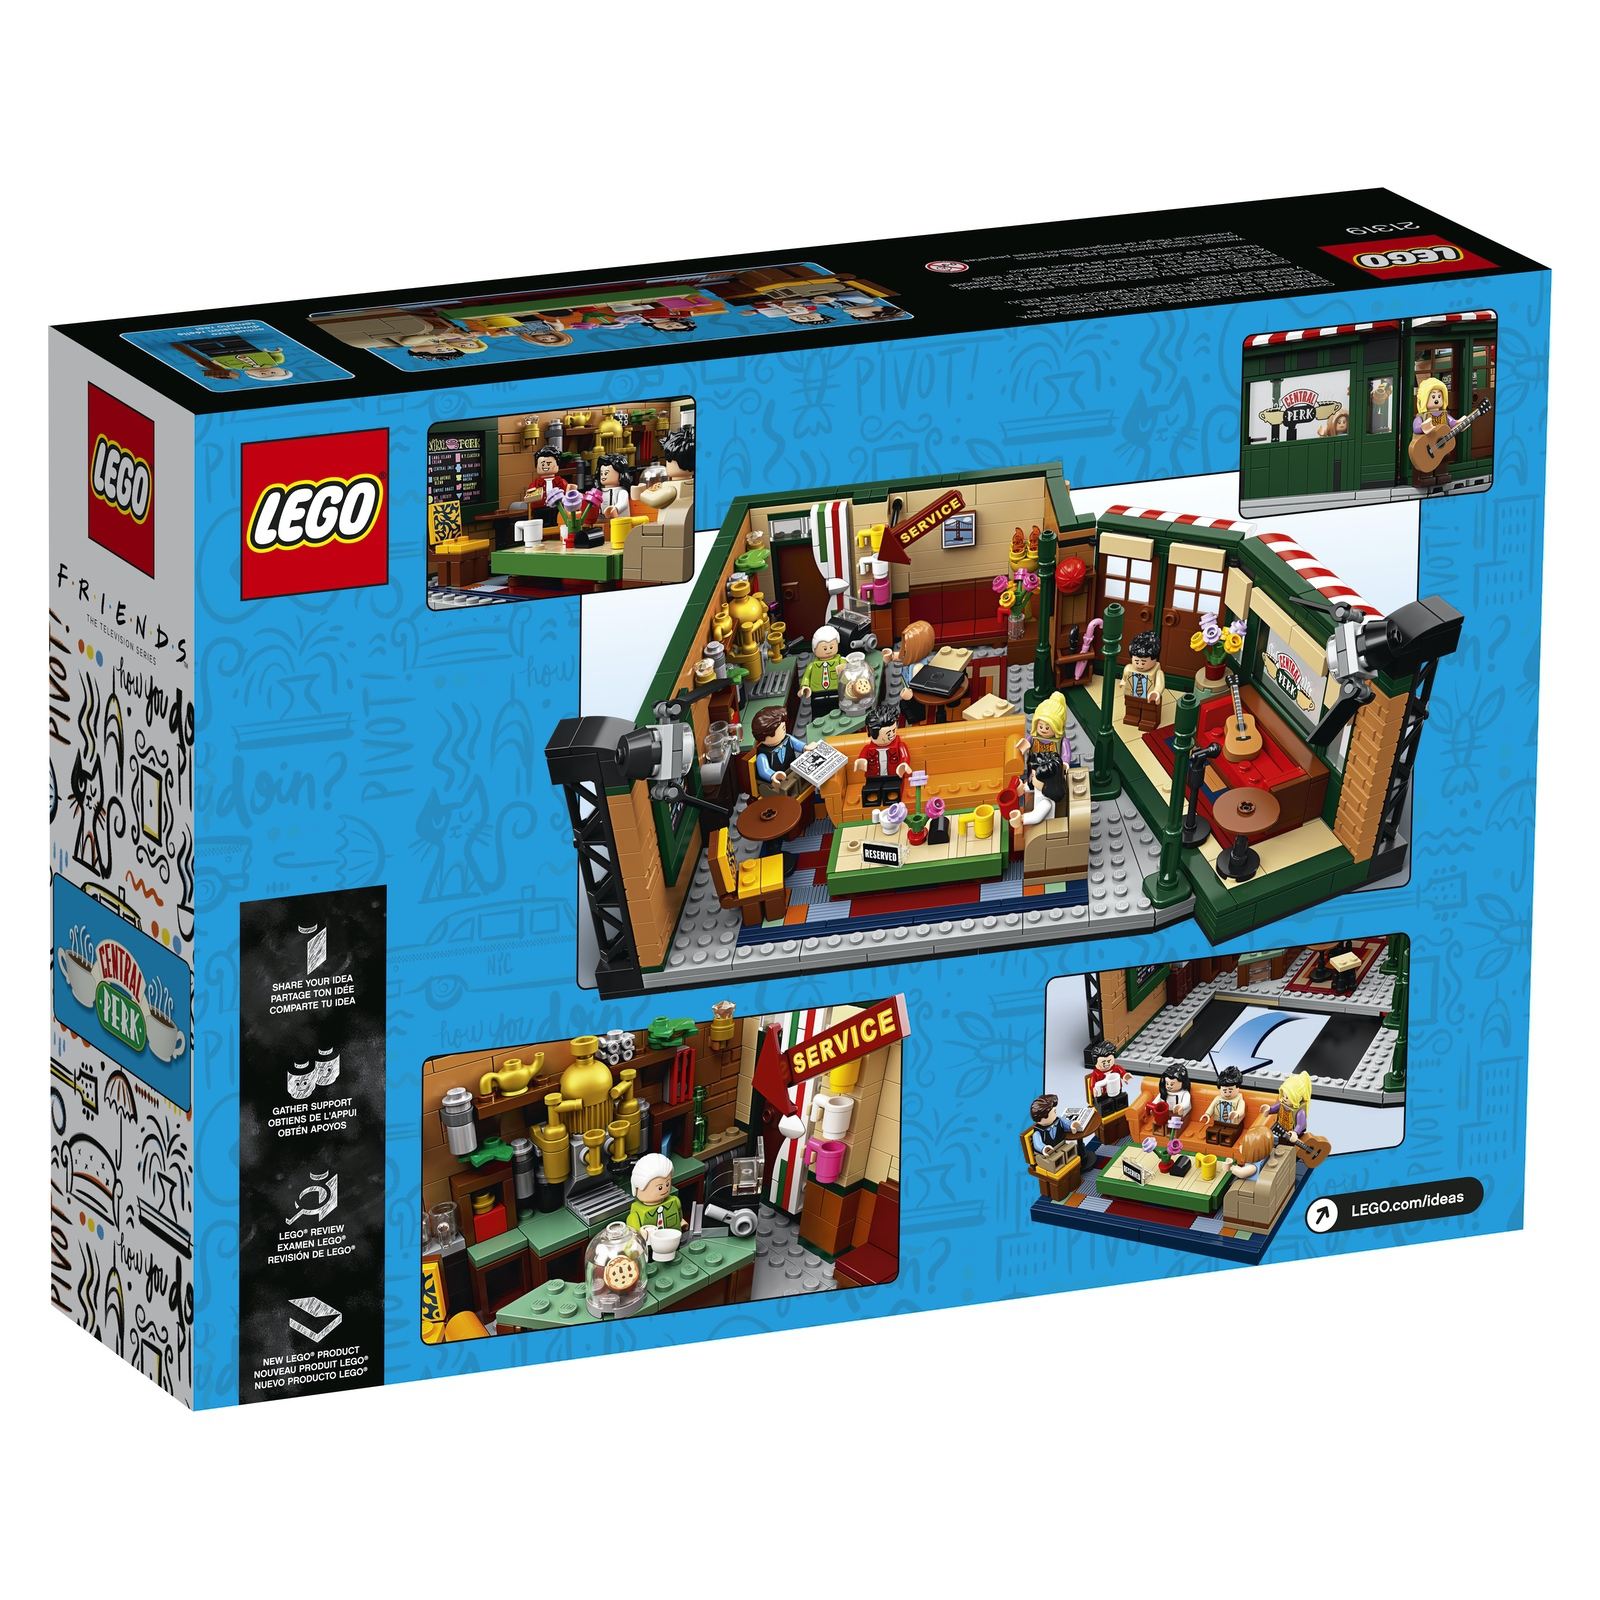 LEGO Friends Central Perk 12